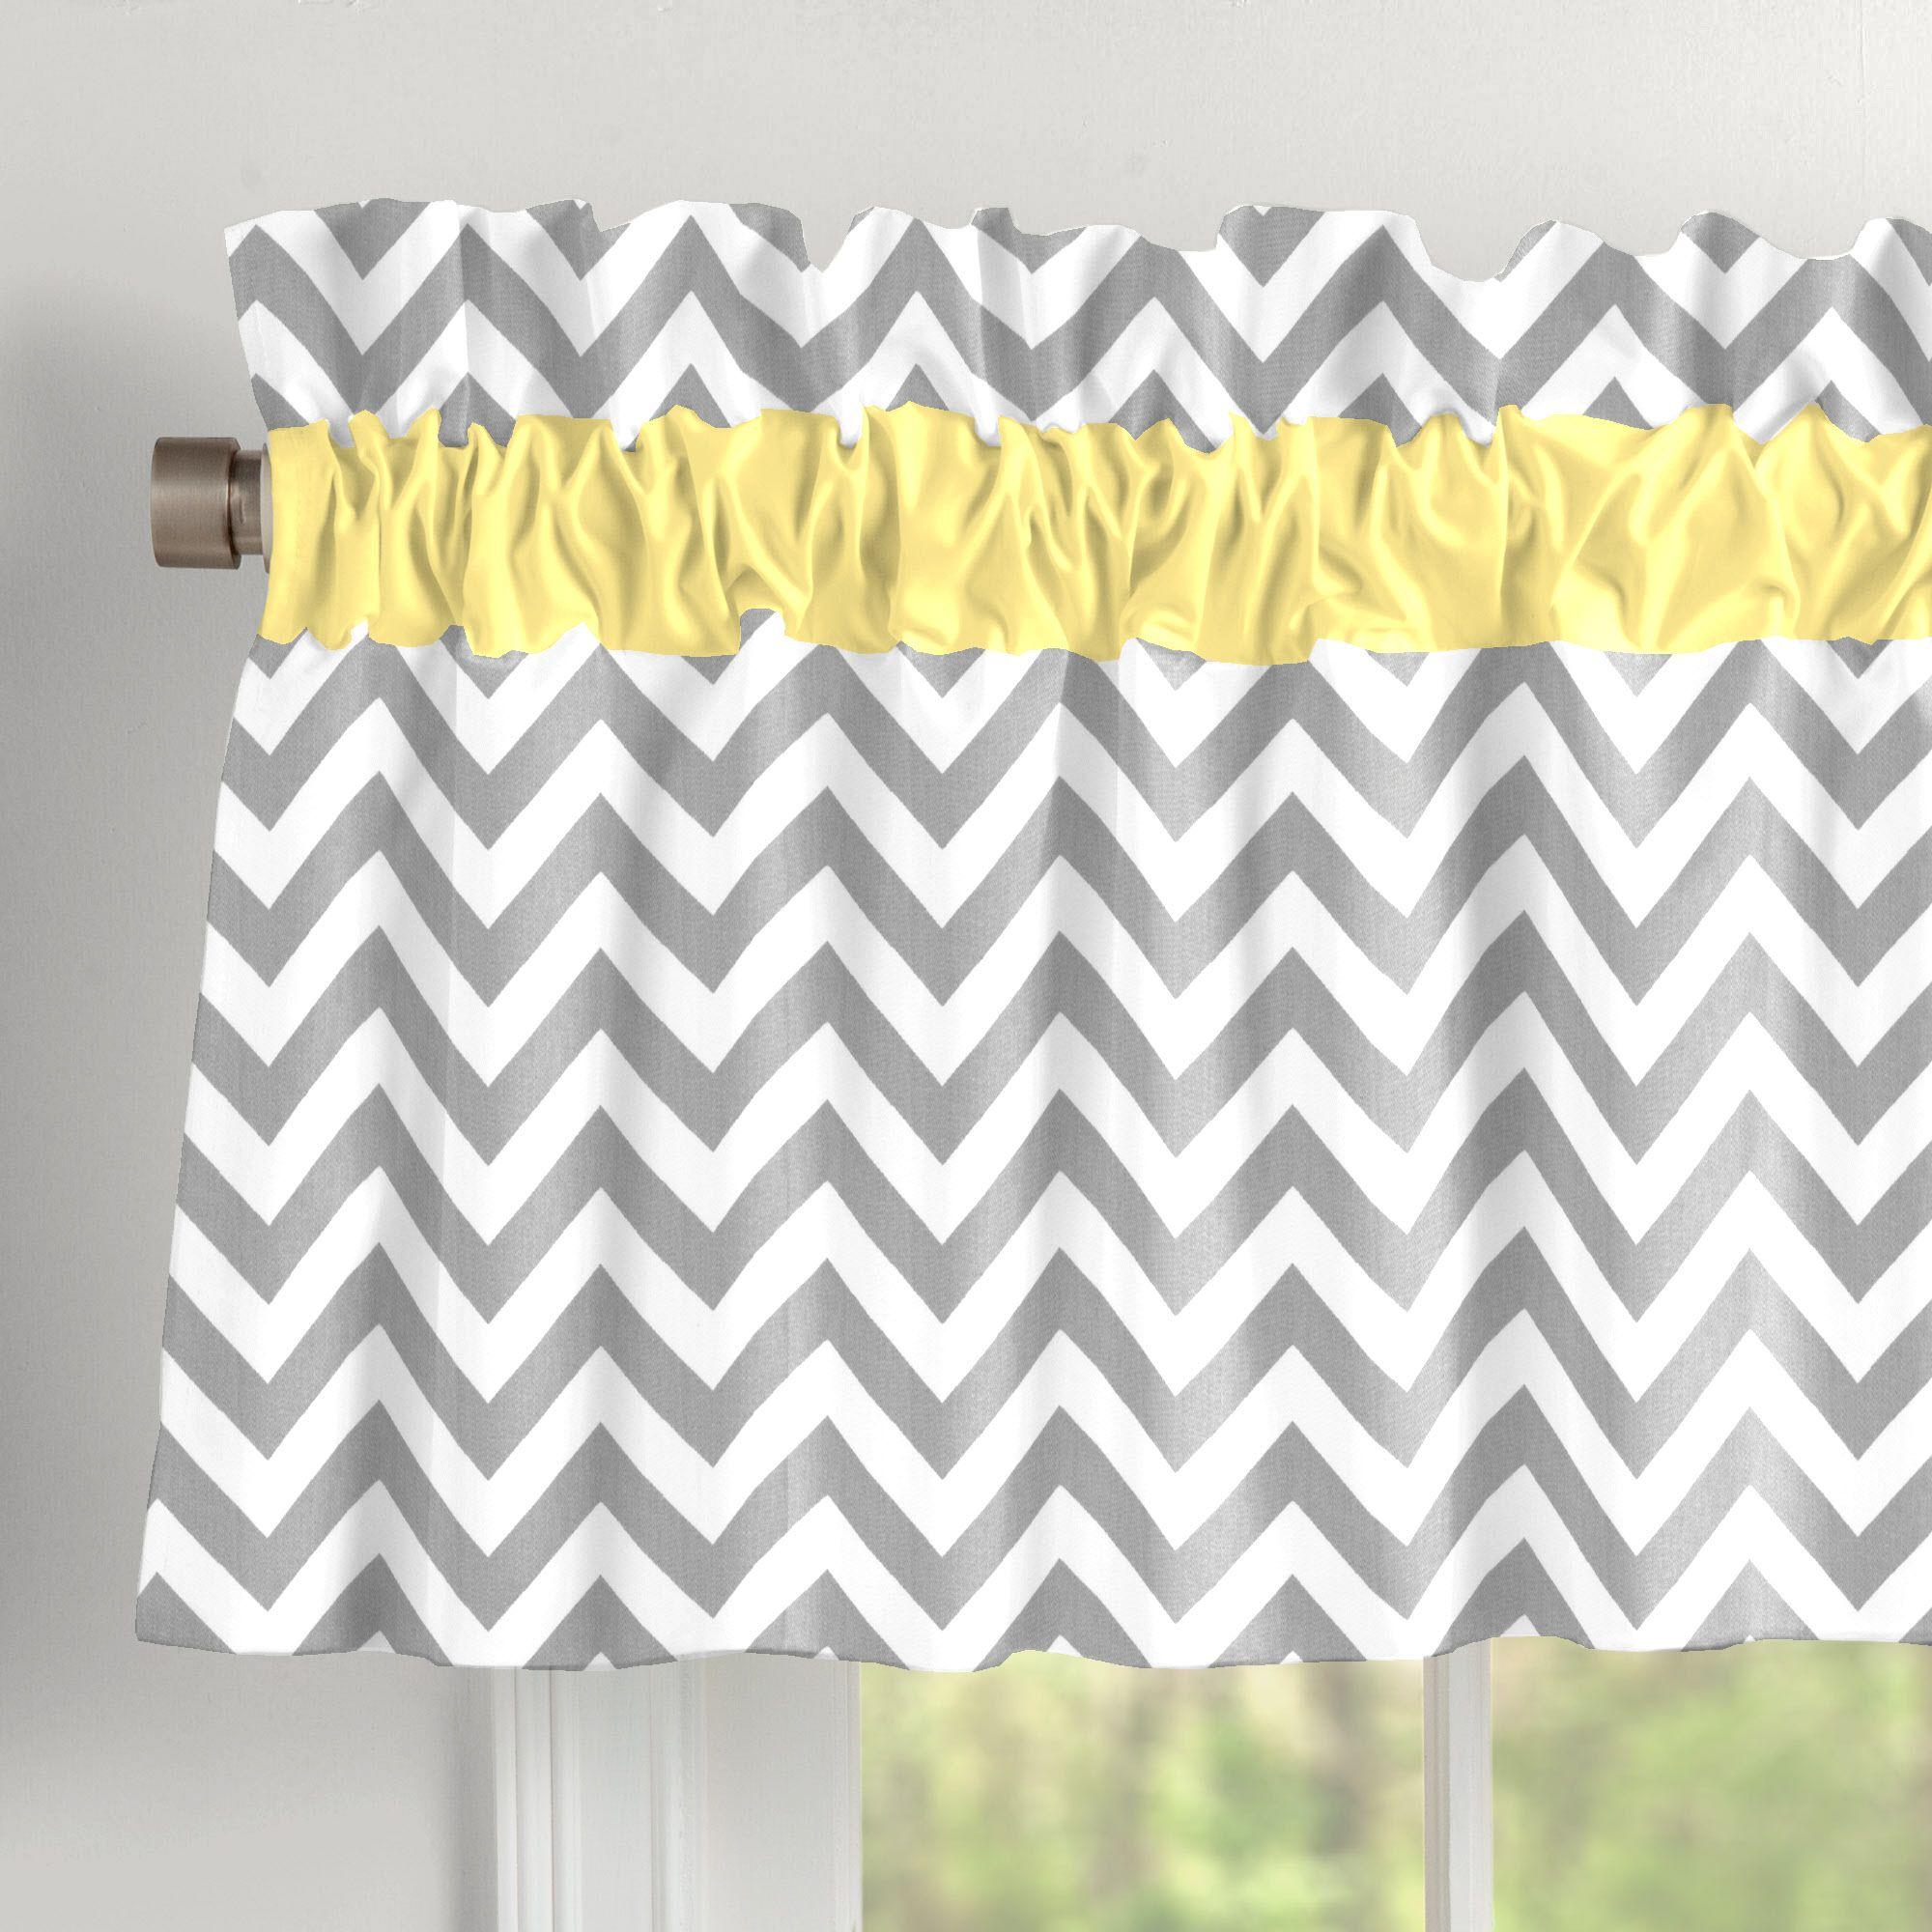 Gray and yellow window treatments - Gray And Yellow Zig Zag Window Valance Rod Pocket